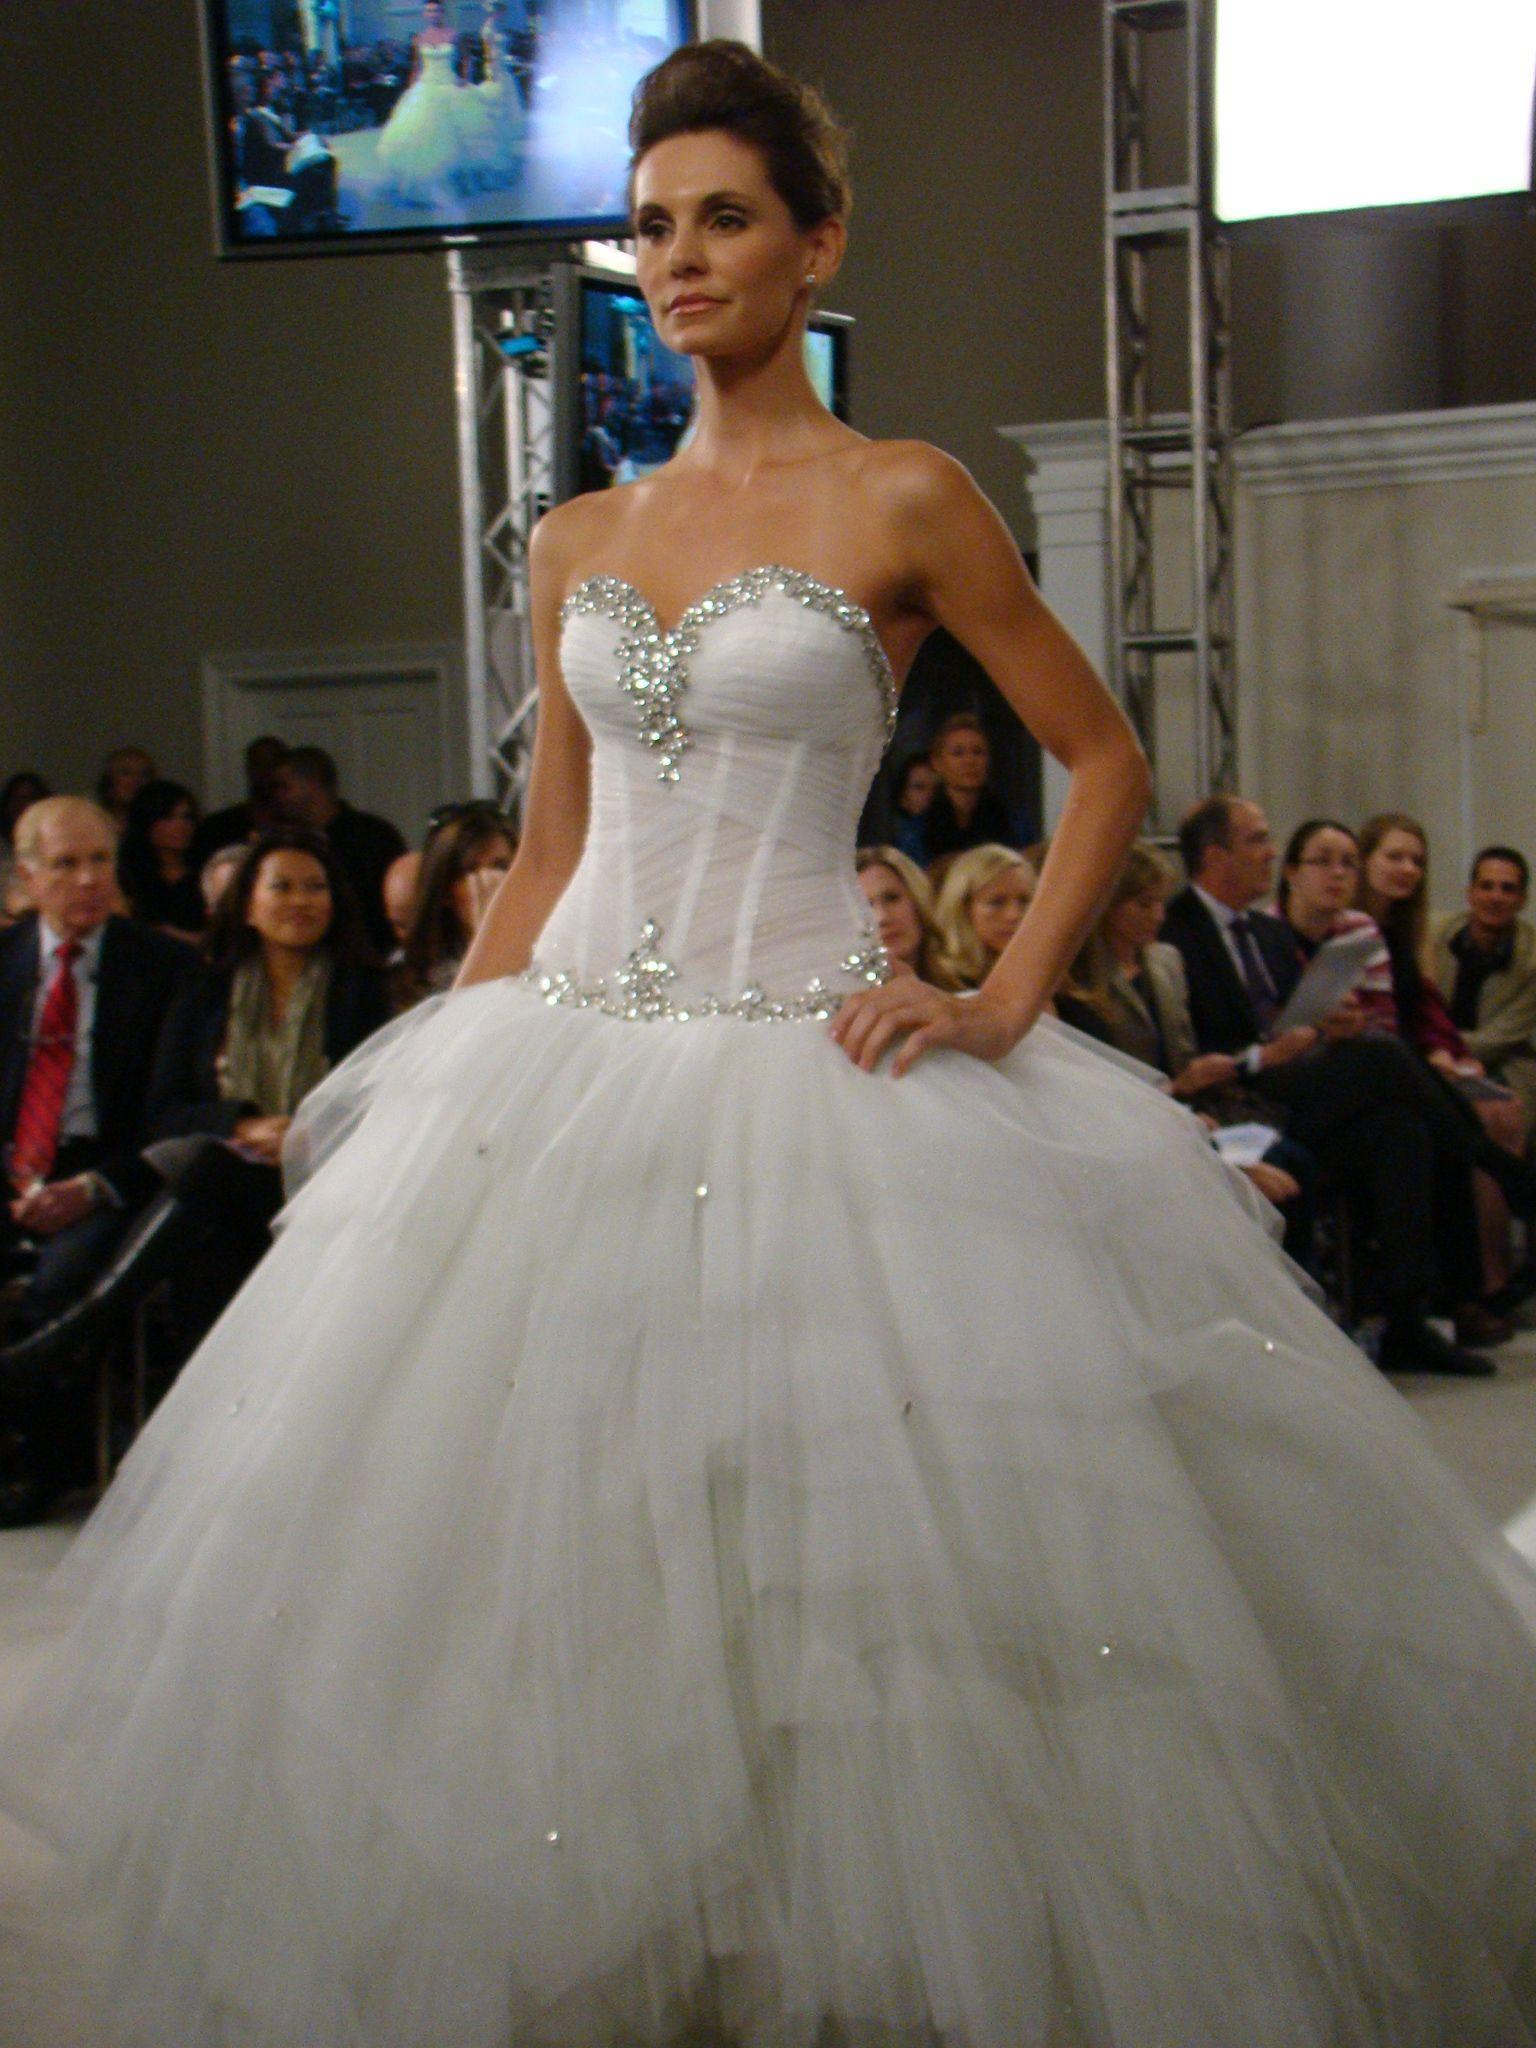 pnina tornai wedding gowns | Pnina Tornai!!! - BeStrawberry ...